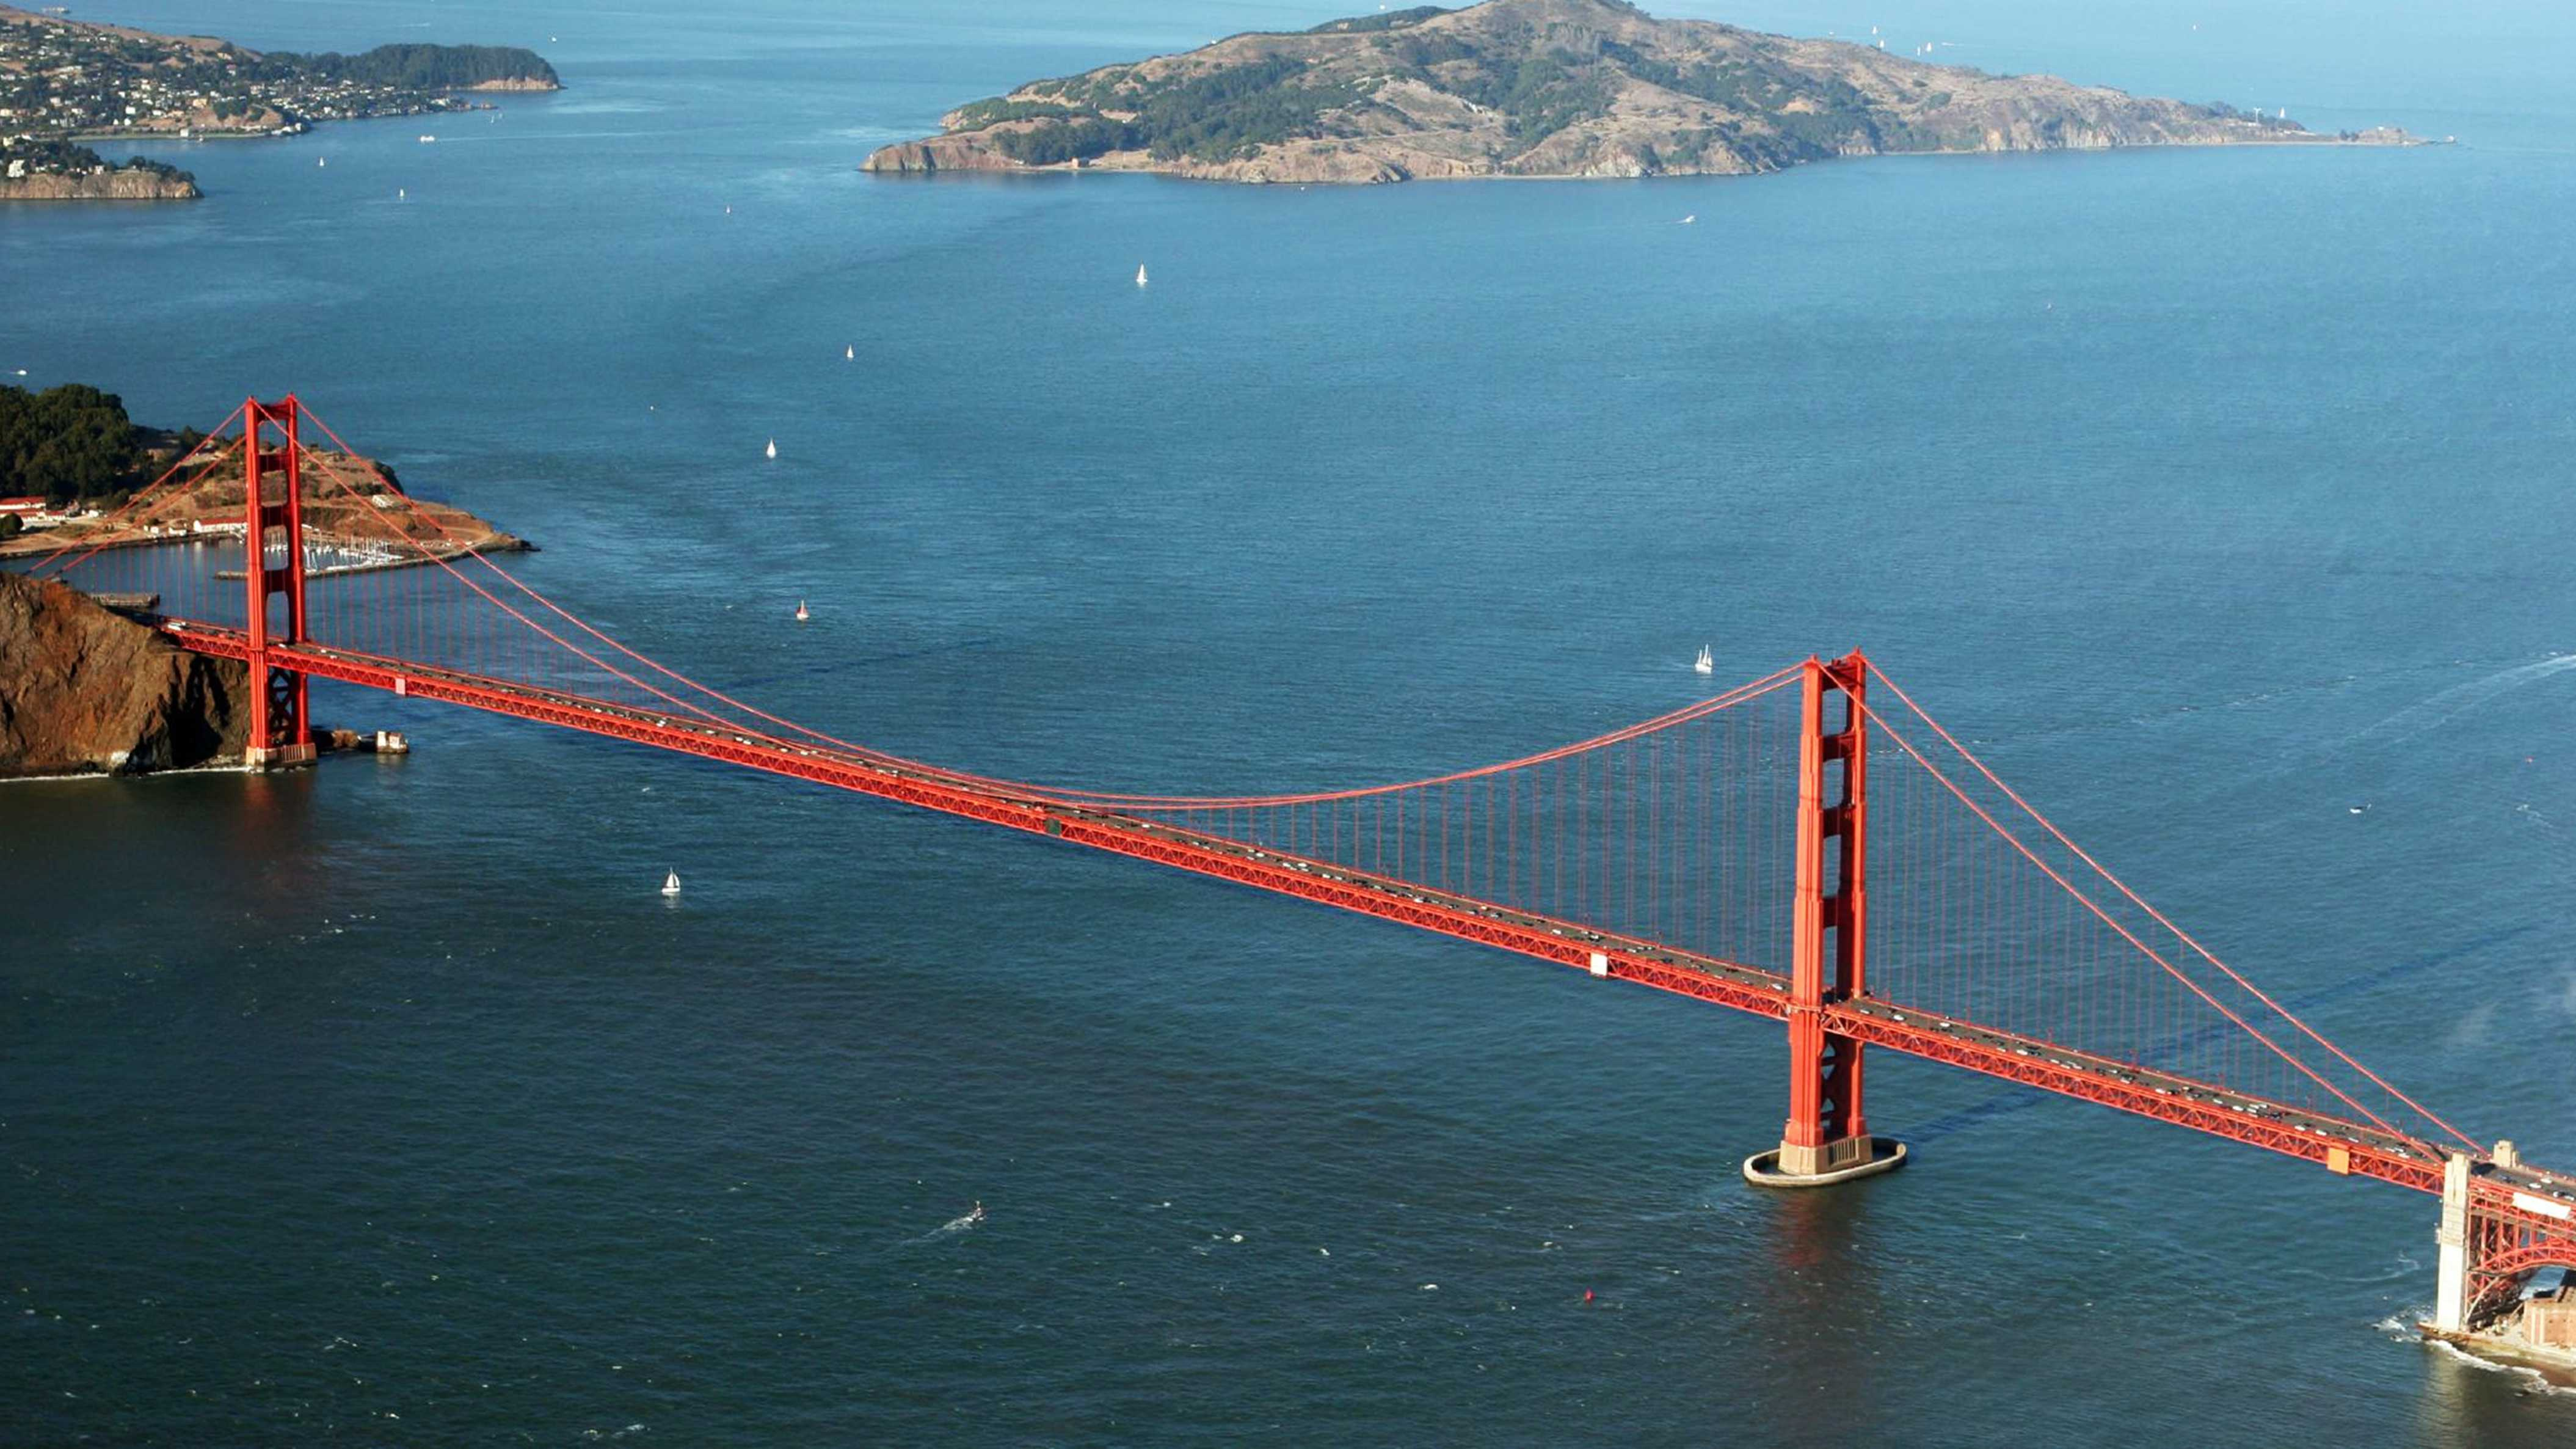 Golden_Gate_Bridge_Aerial.jpg